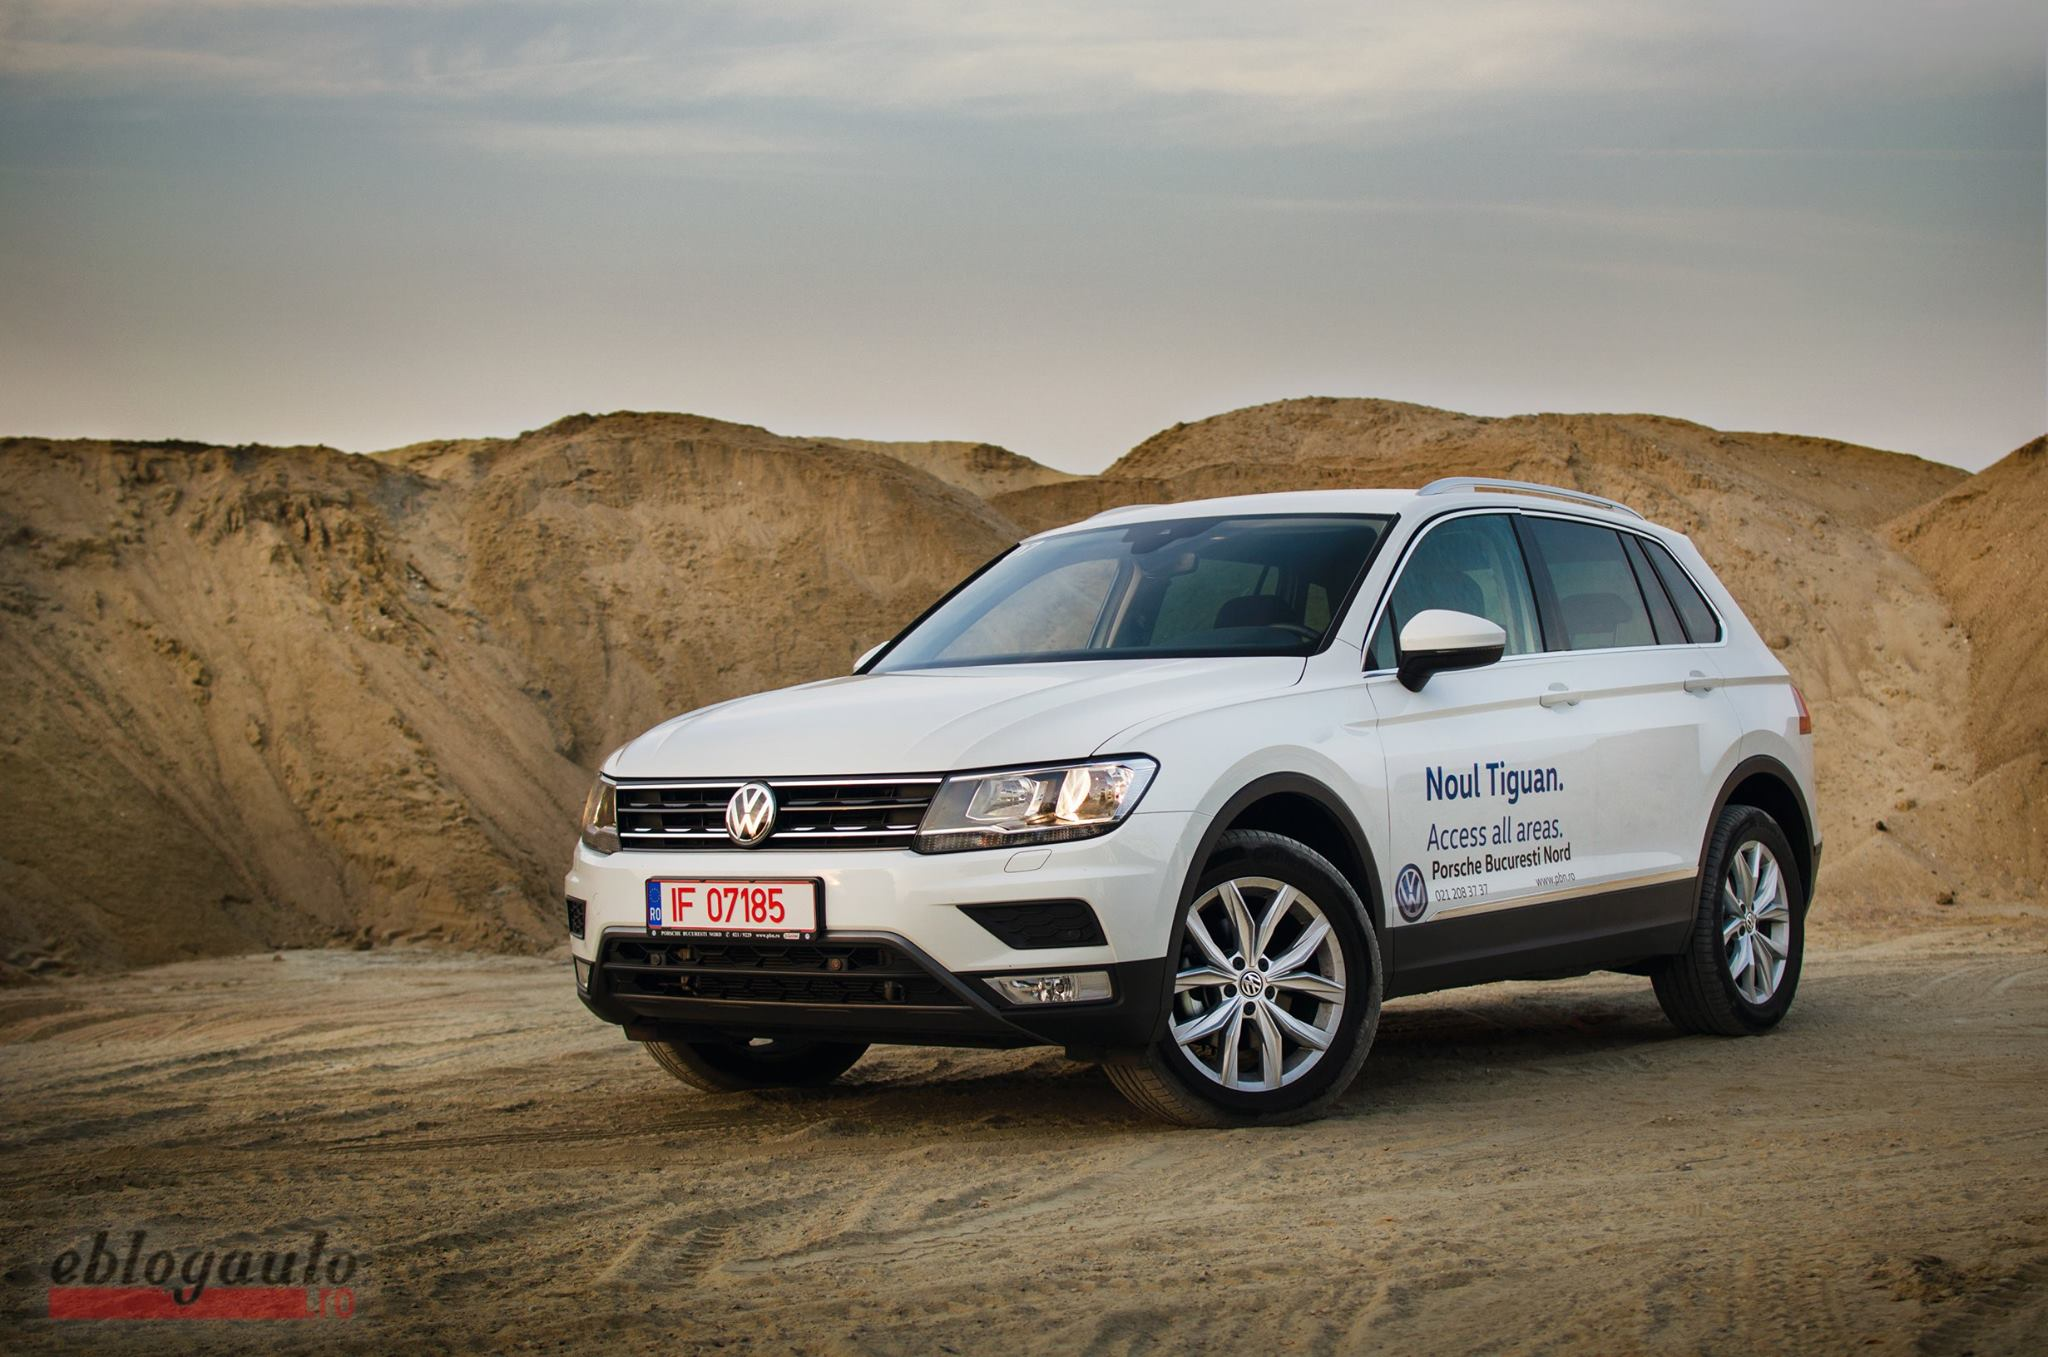 Test Drive Volkswagen Tiguan 2.0 TDI 150 CP DSG REVIEW & VIDEO